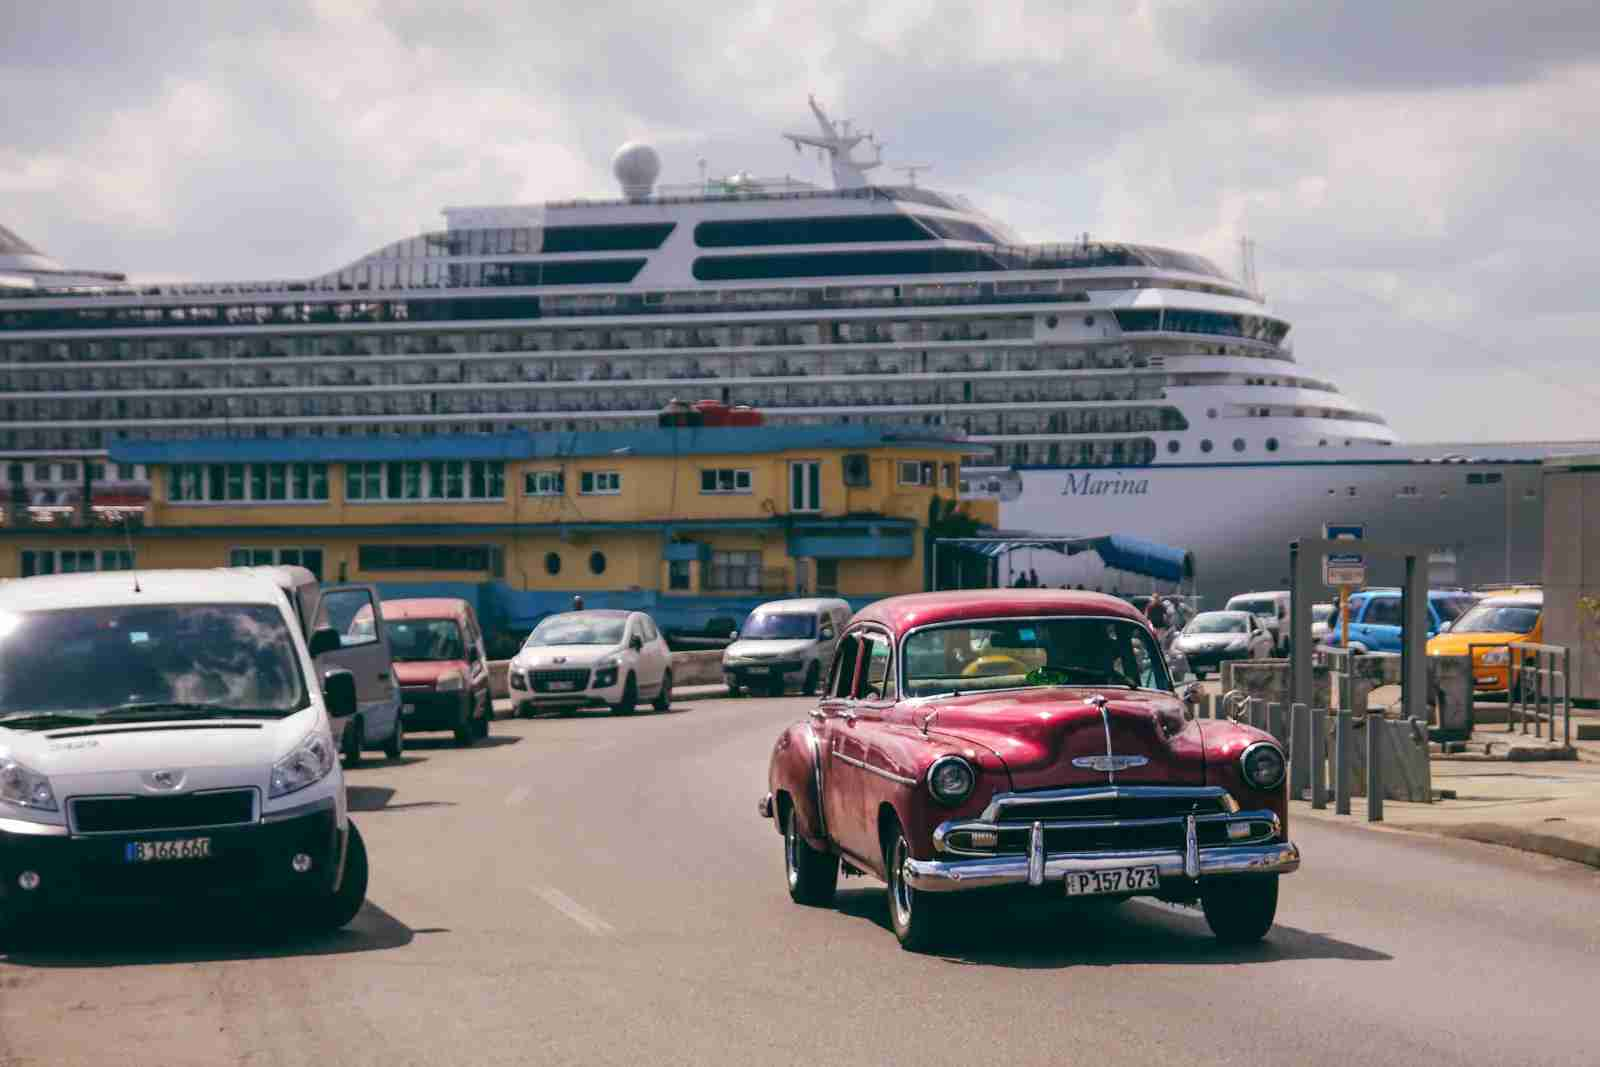 Cuba cruise ship docked in Havana with car